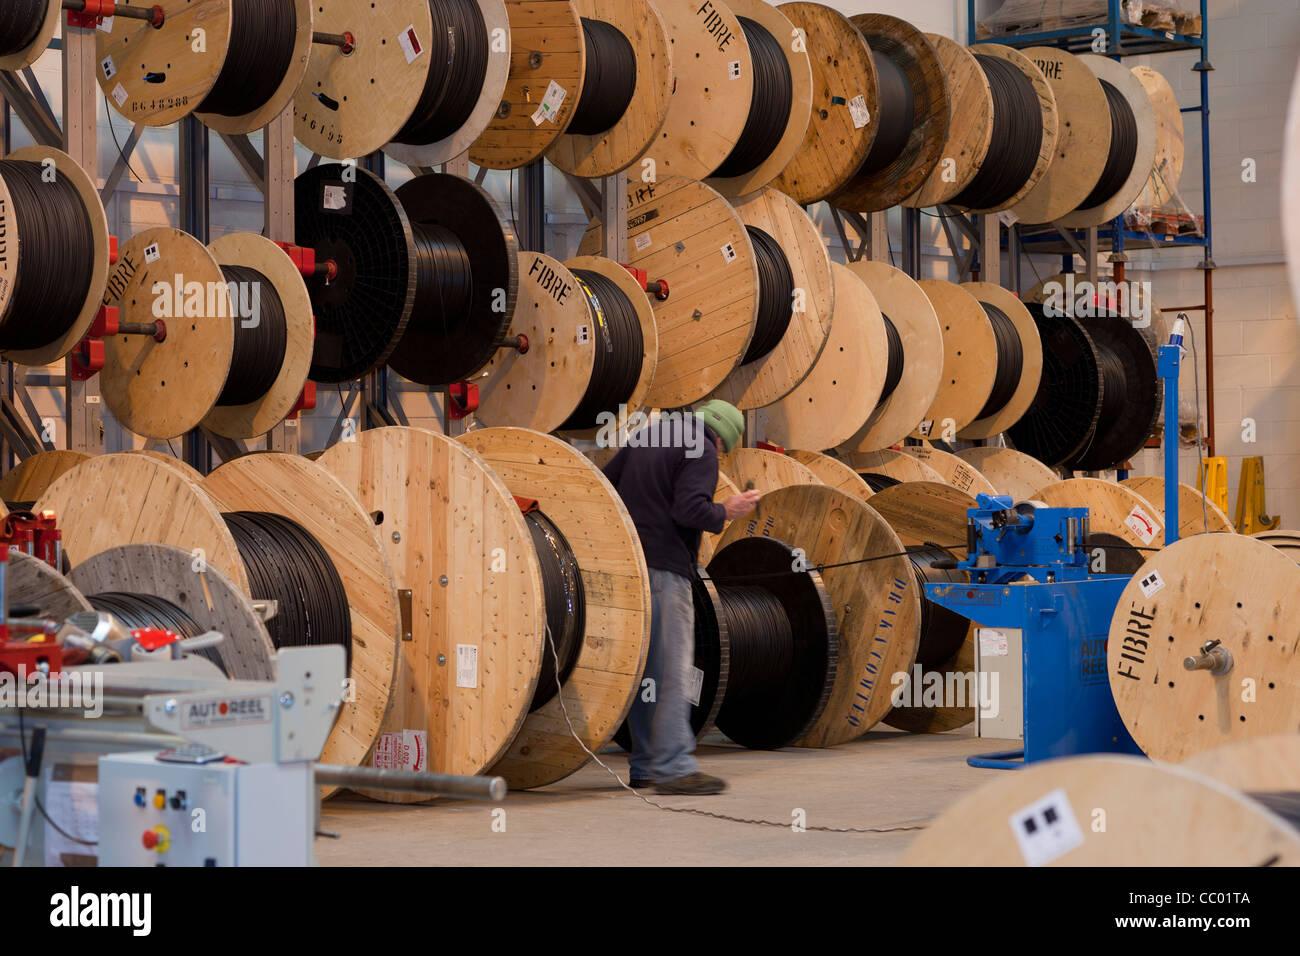 Flexible Display Stockfotos & Flexible Display Bilder - Alamy